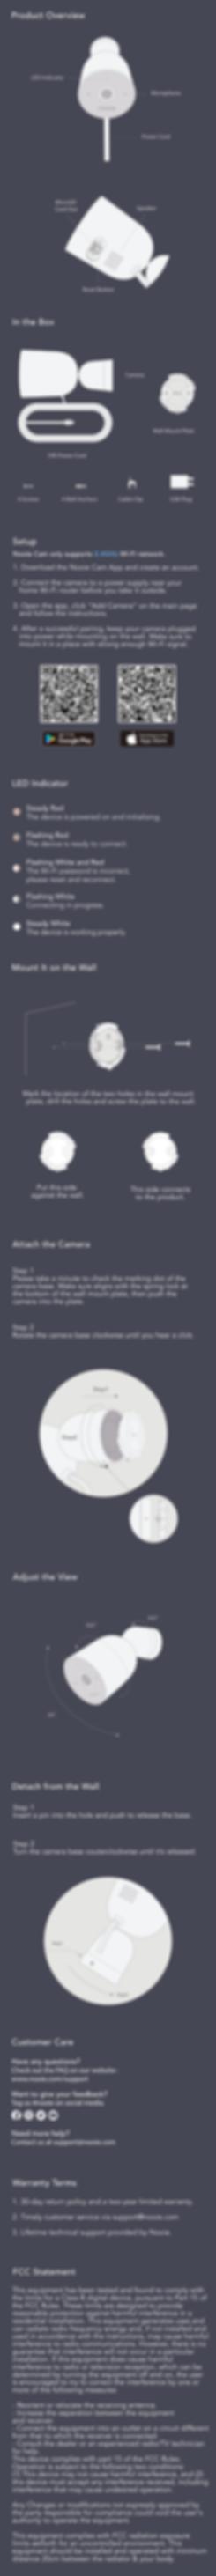 Nooie Cam Outdoor_User Manual_For App-02